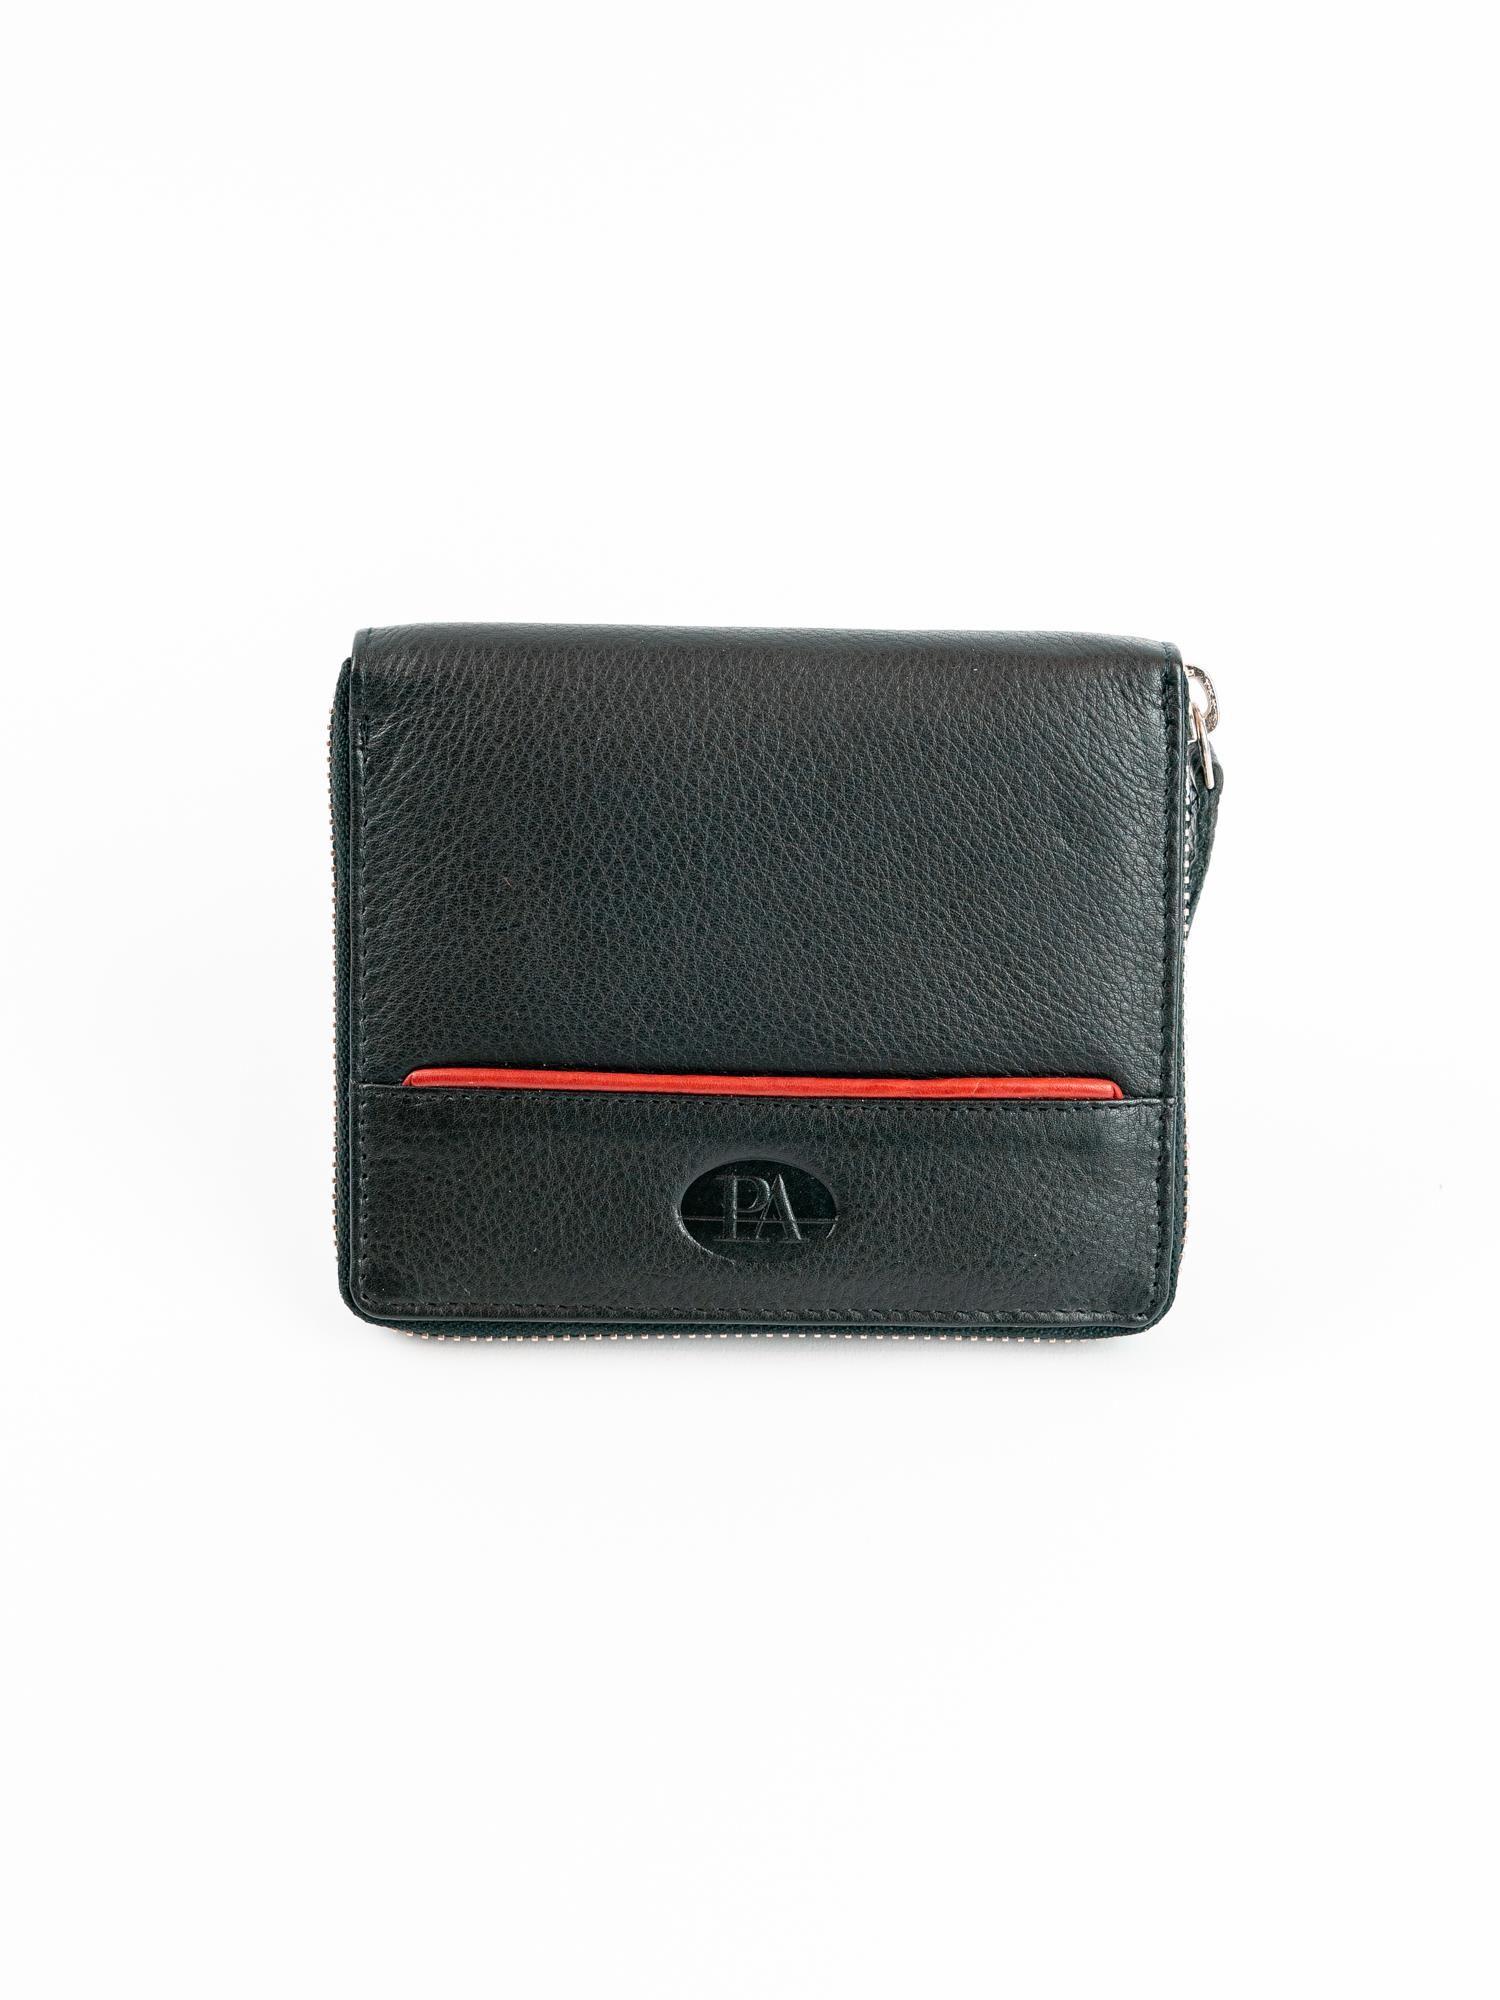 e2d2614e76343 Czarny męski portfel ze skóry na suwak - Mężczyźni portfel męski ...